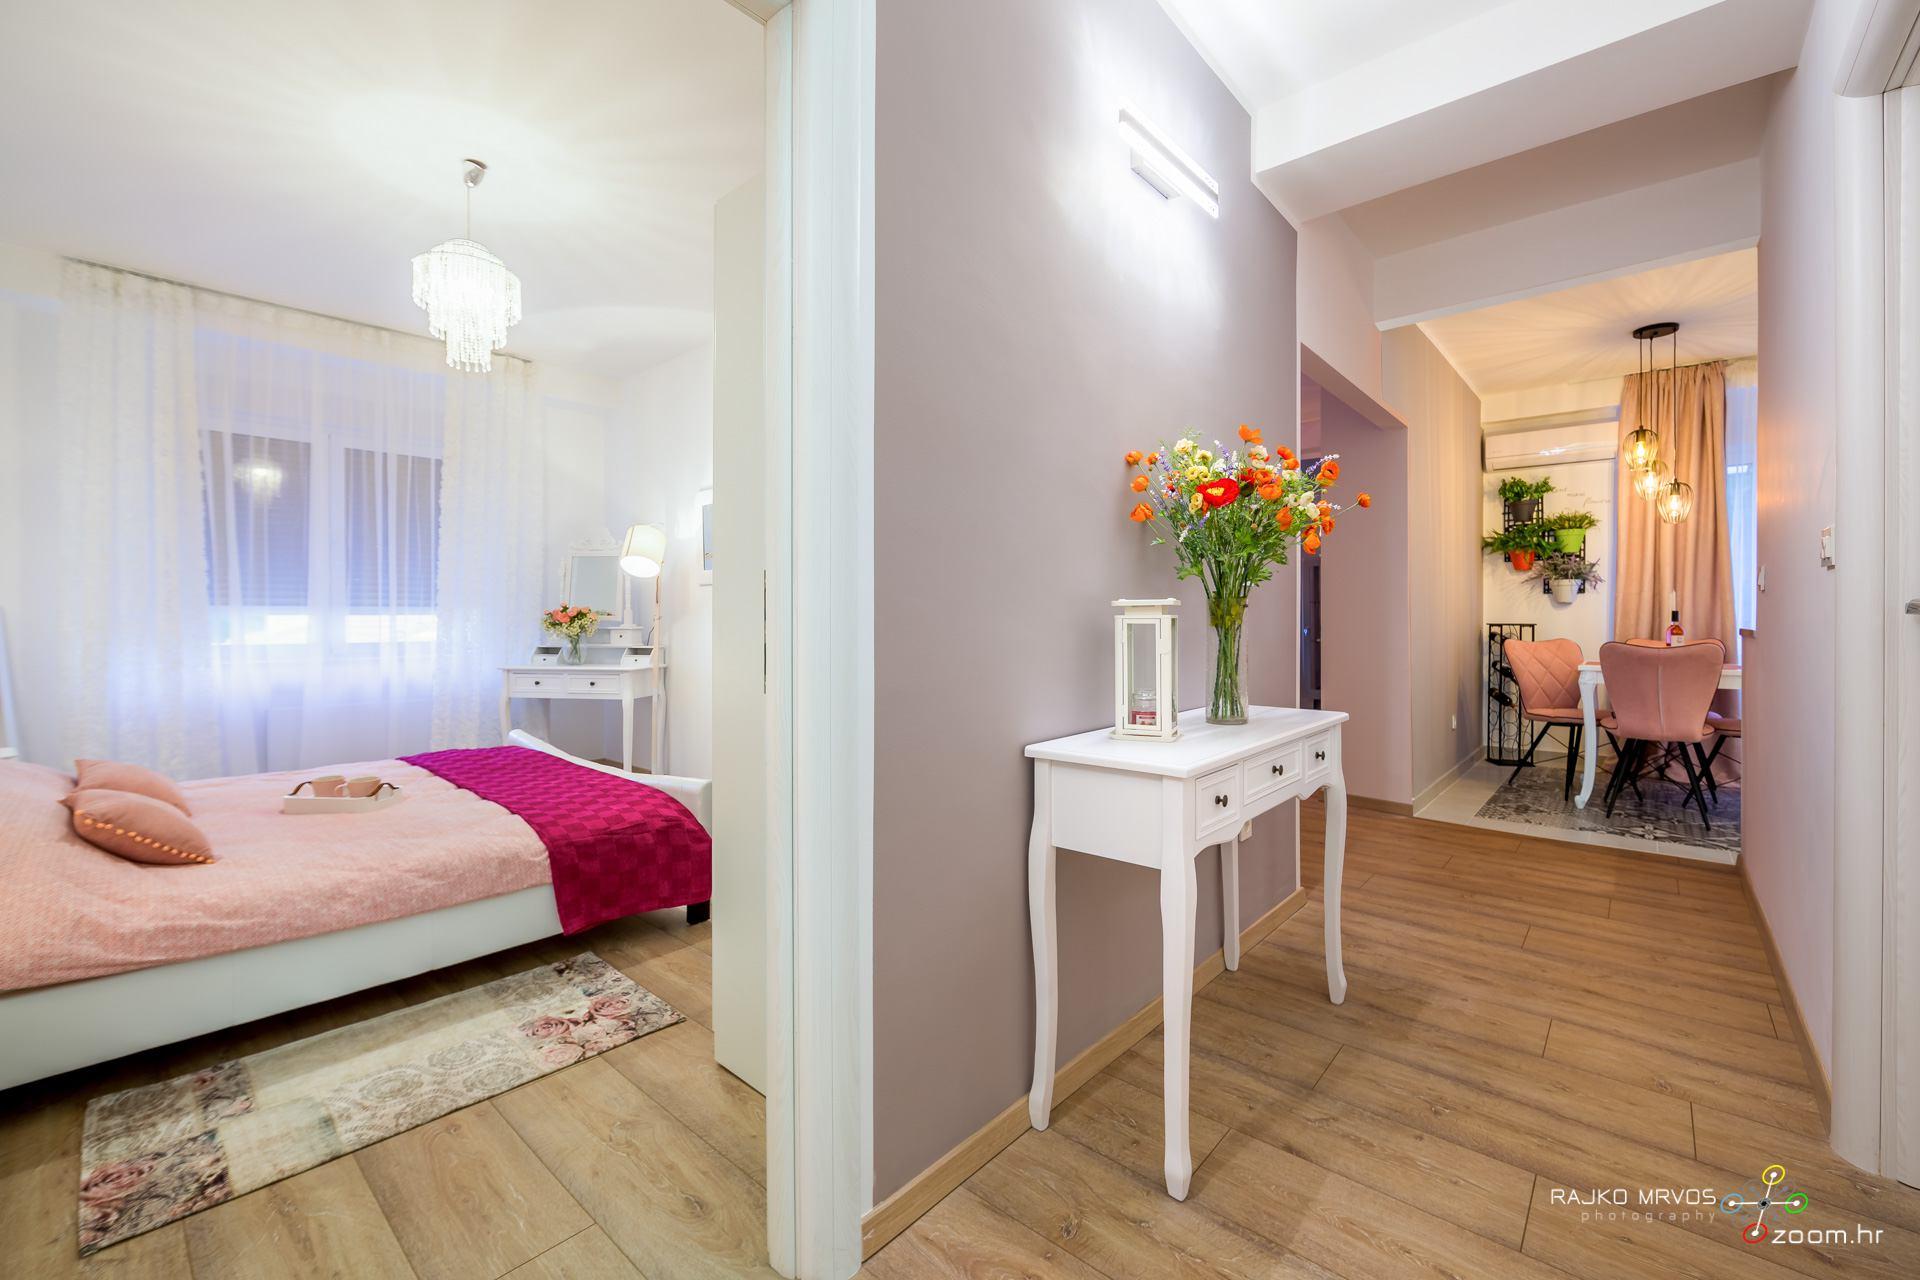 fotografiranje-interijera-fotograf-apartmana-vila-kuca-hotela-apartman-Gabby-Rijeka-3